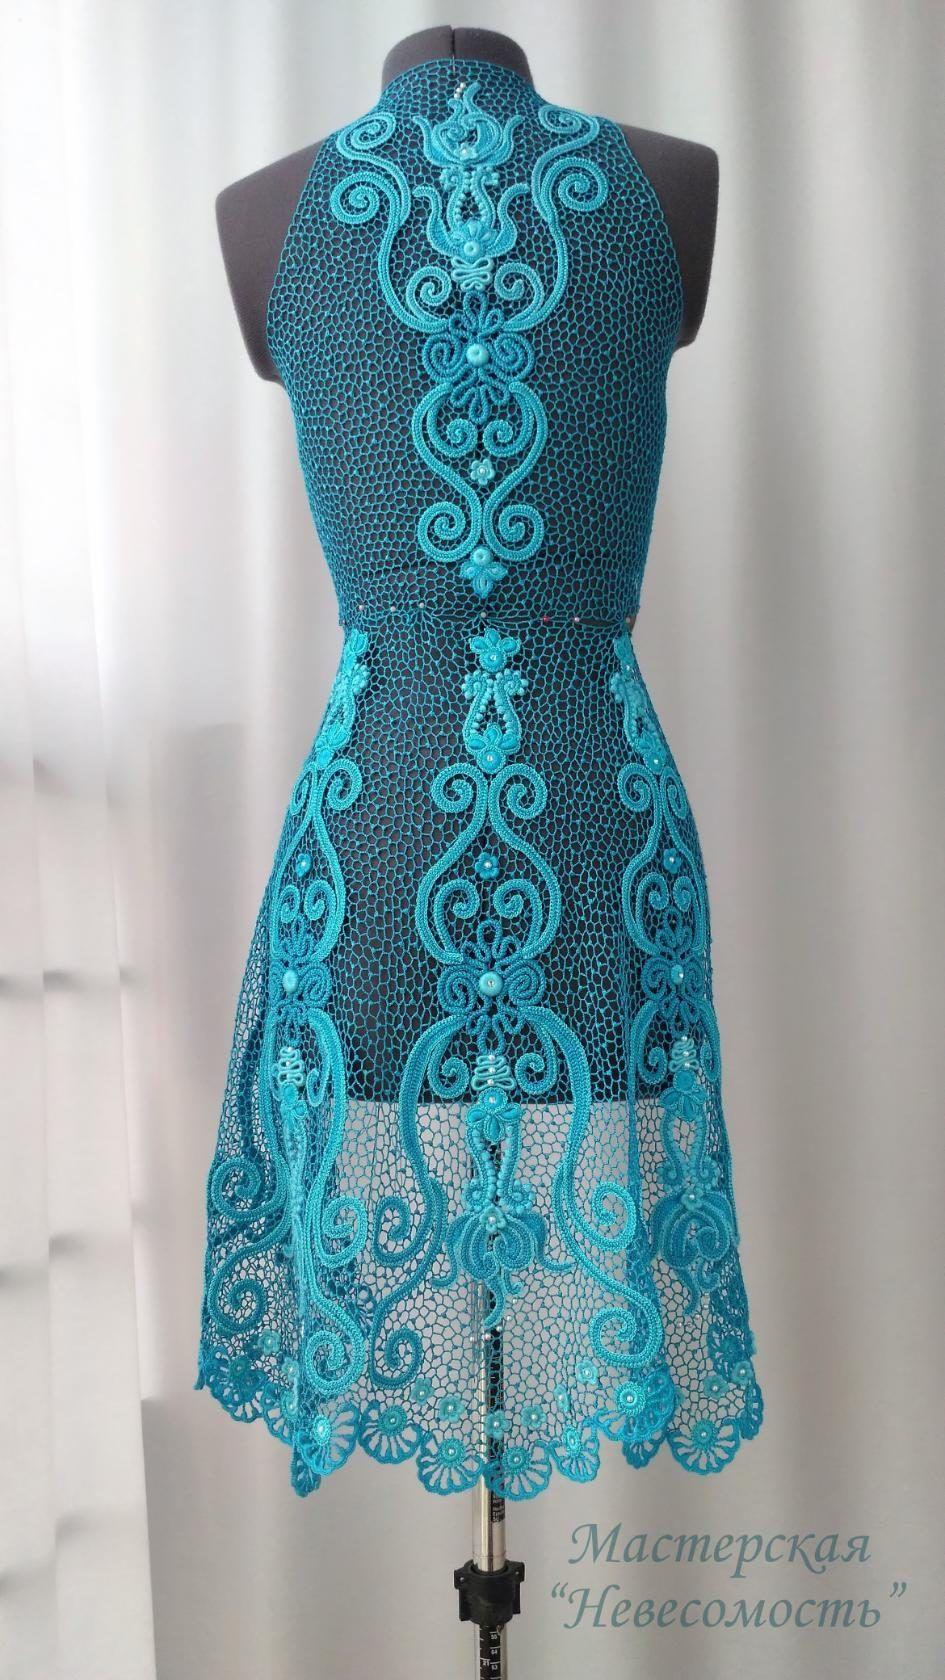 Irish crochet dress | irish crochet | Pinterest | Crochet, Japanese ...